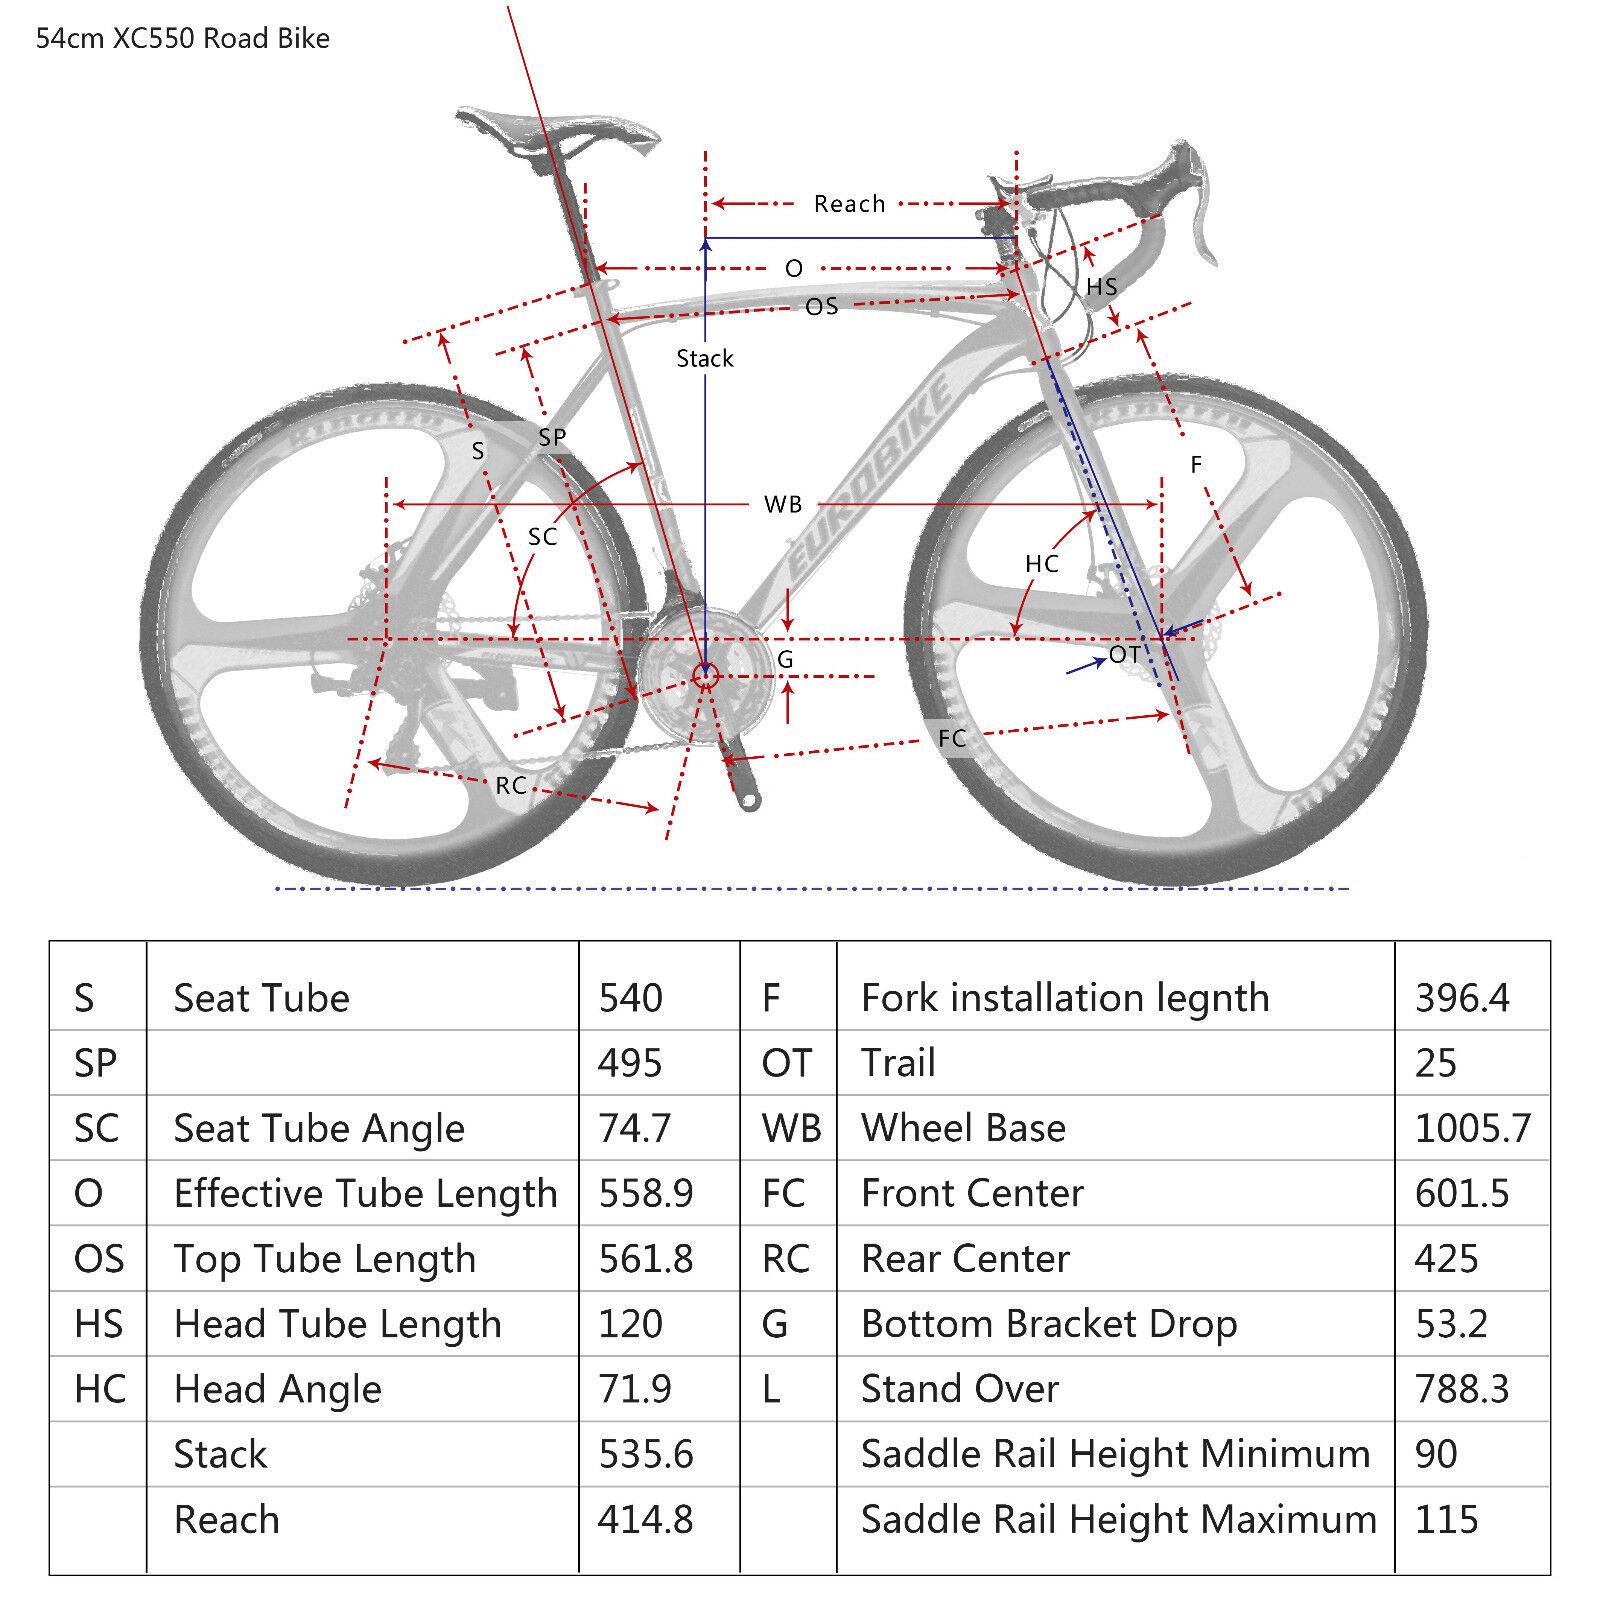 70e9966fb86 EUROBIKE Road Bike 700C Wheels 21 Speed Disc Brake Bicycle, Size M - 54cm  for sale online | eBay